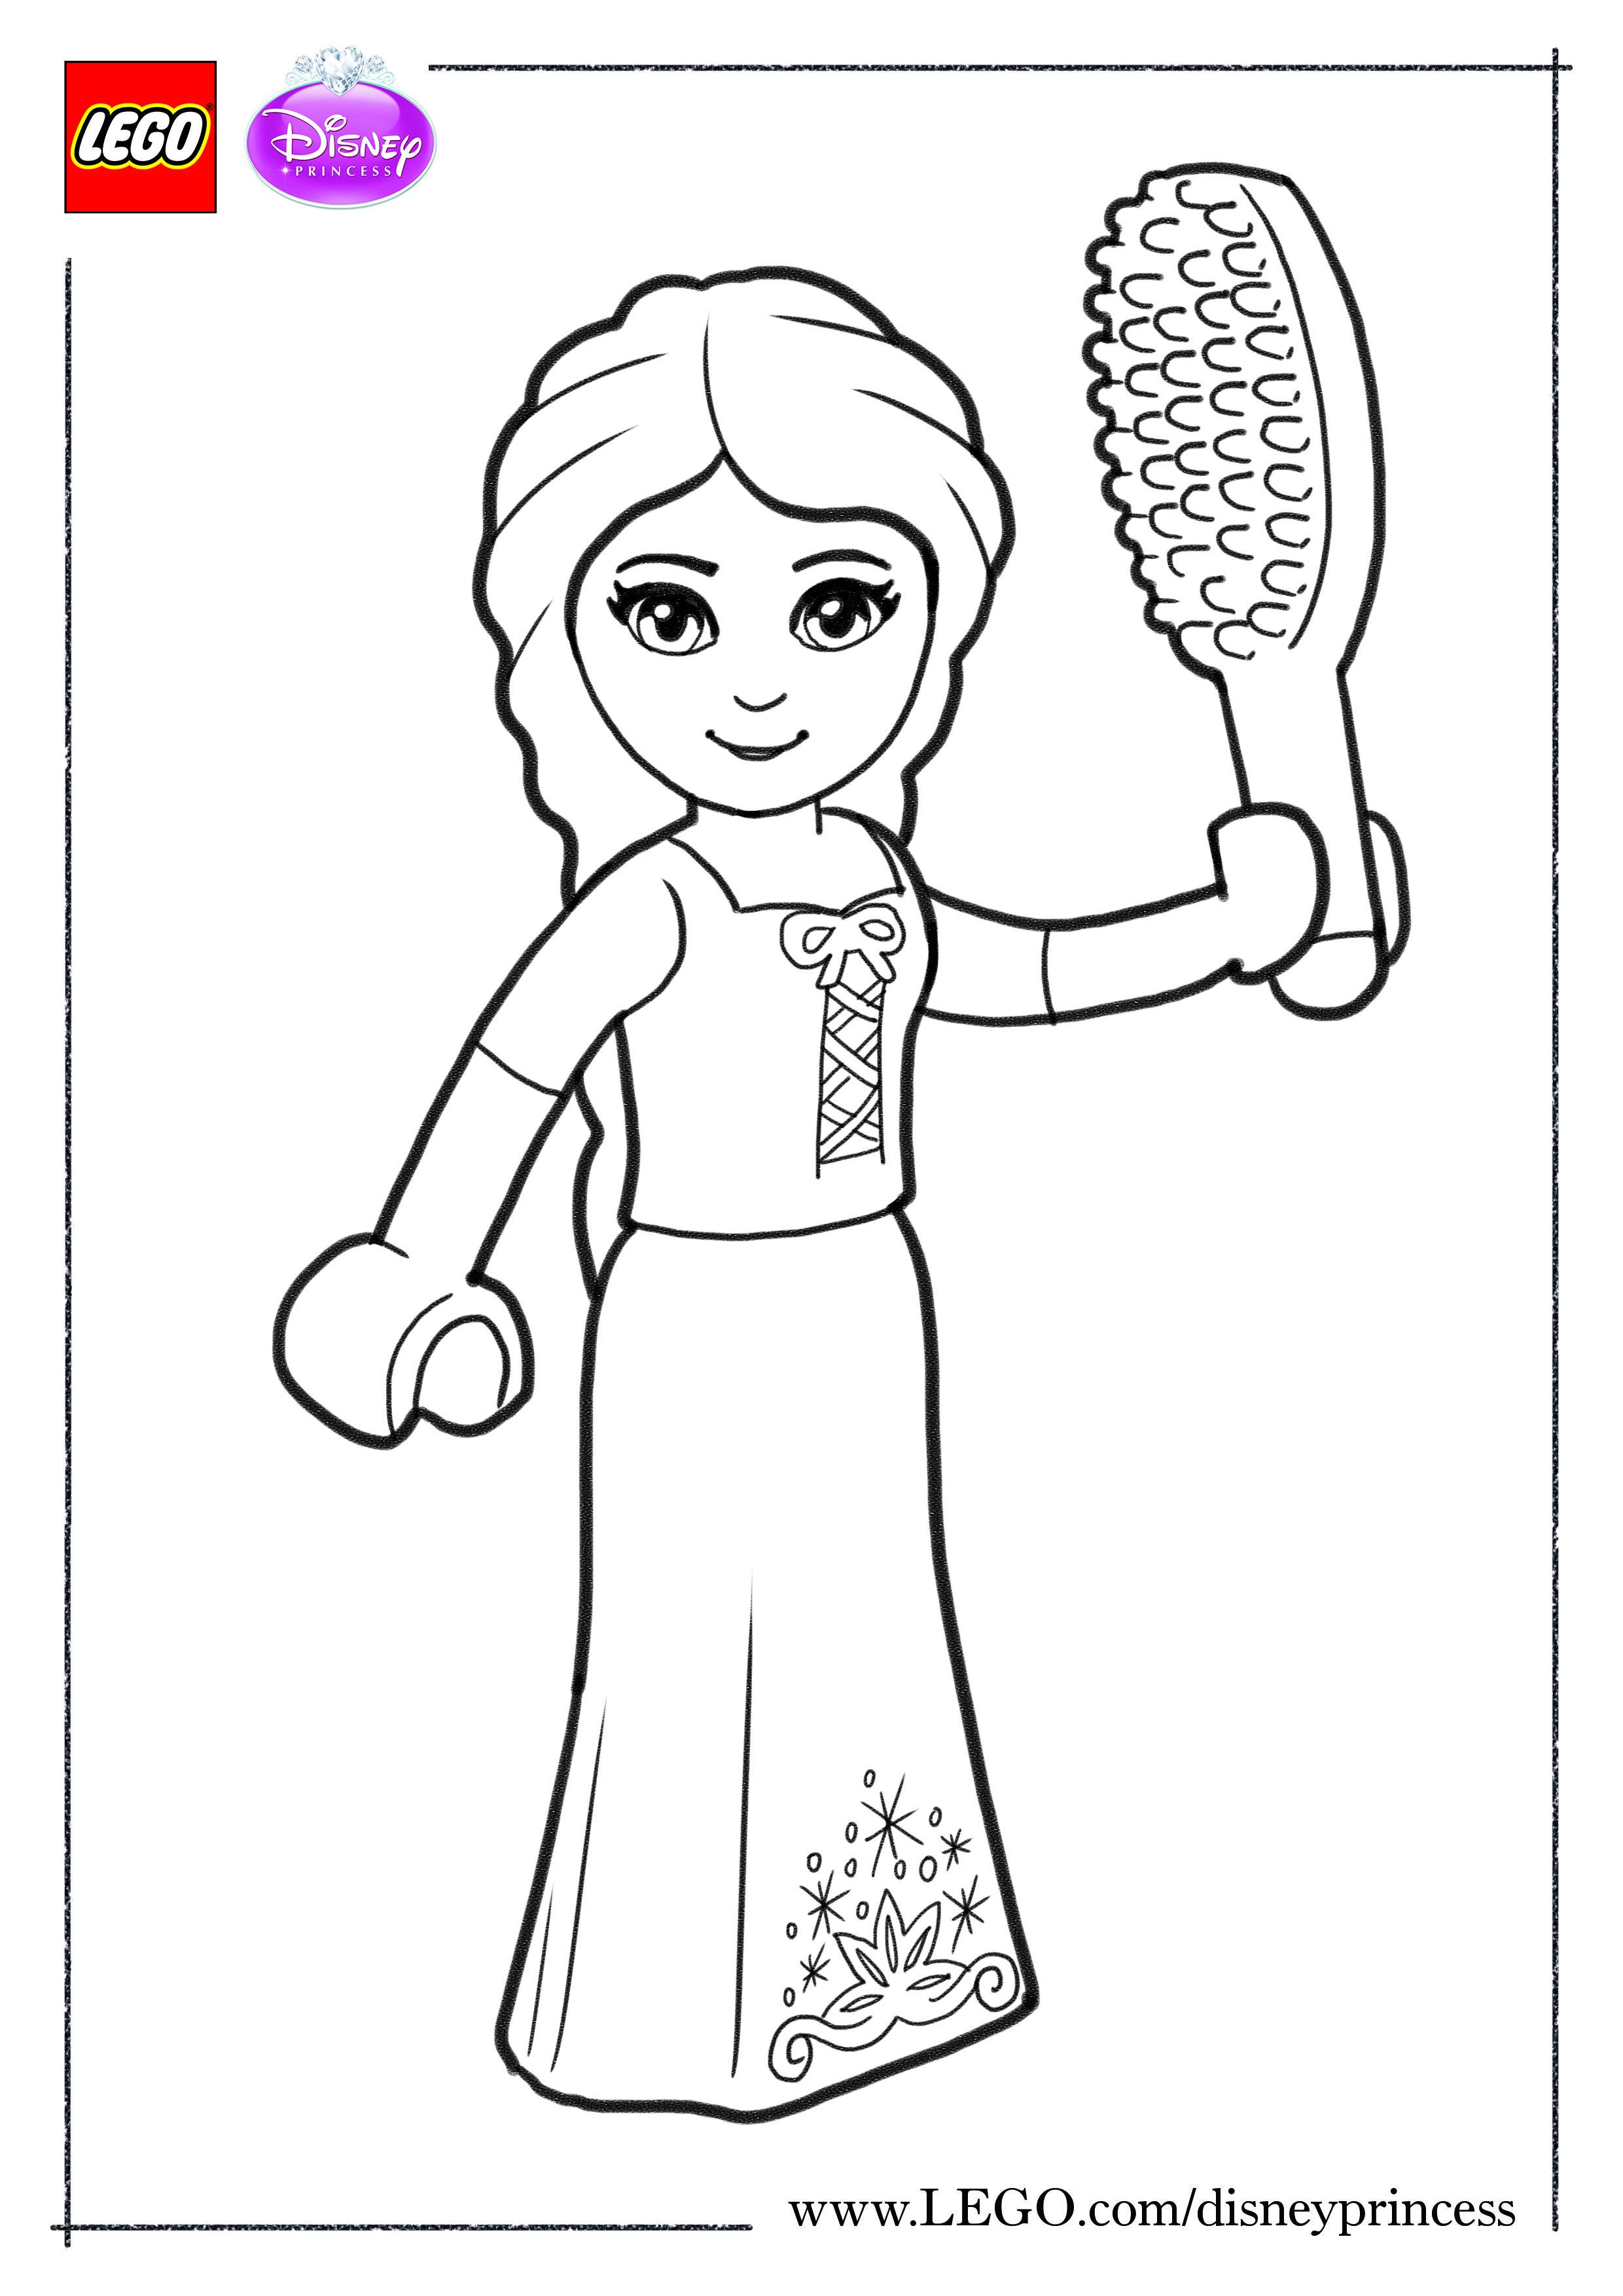 Print and colour our LEGO Disney Princess Rapunzel